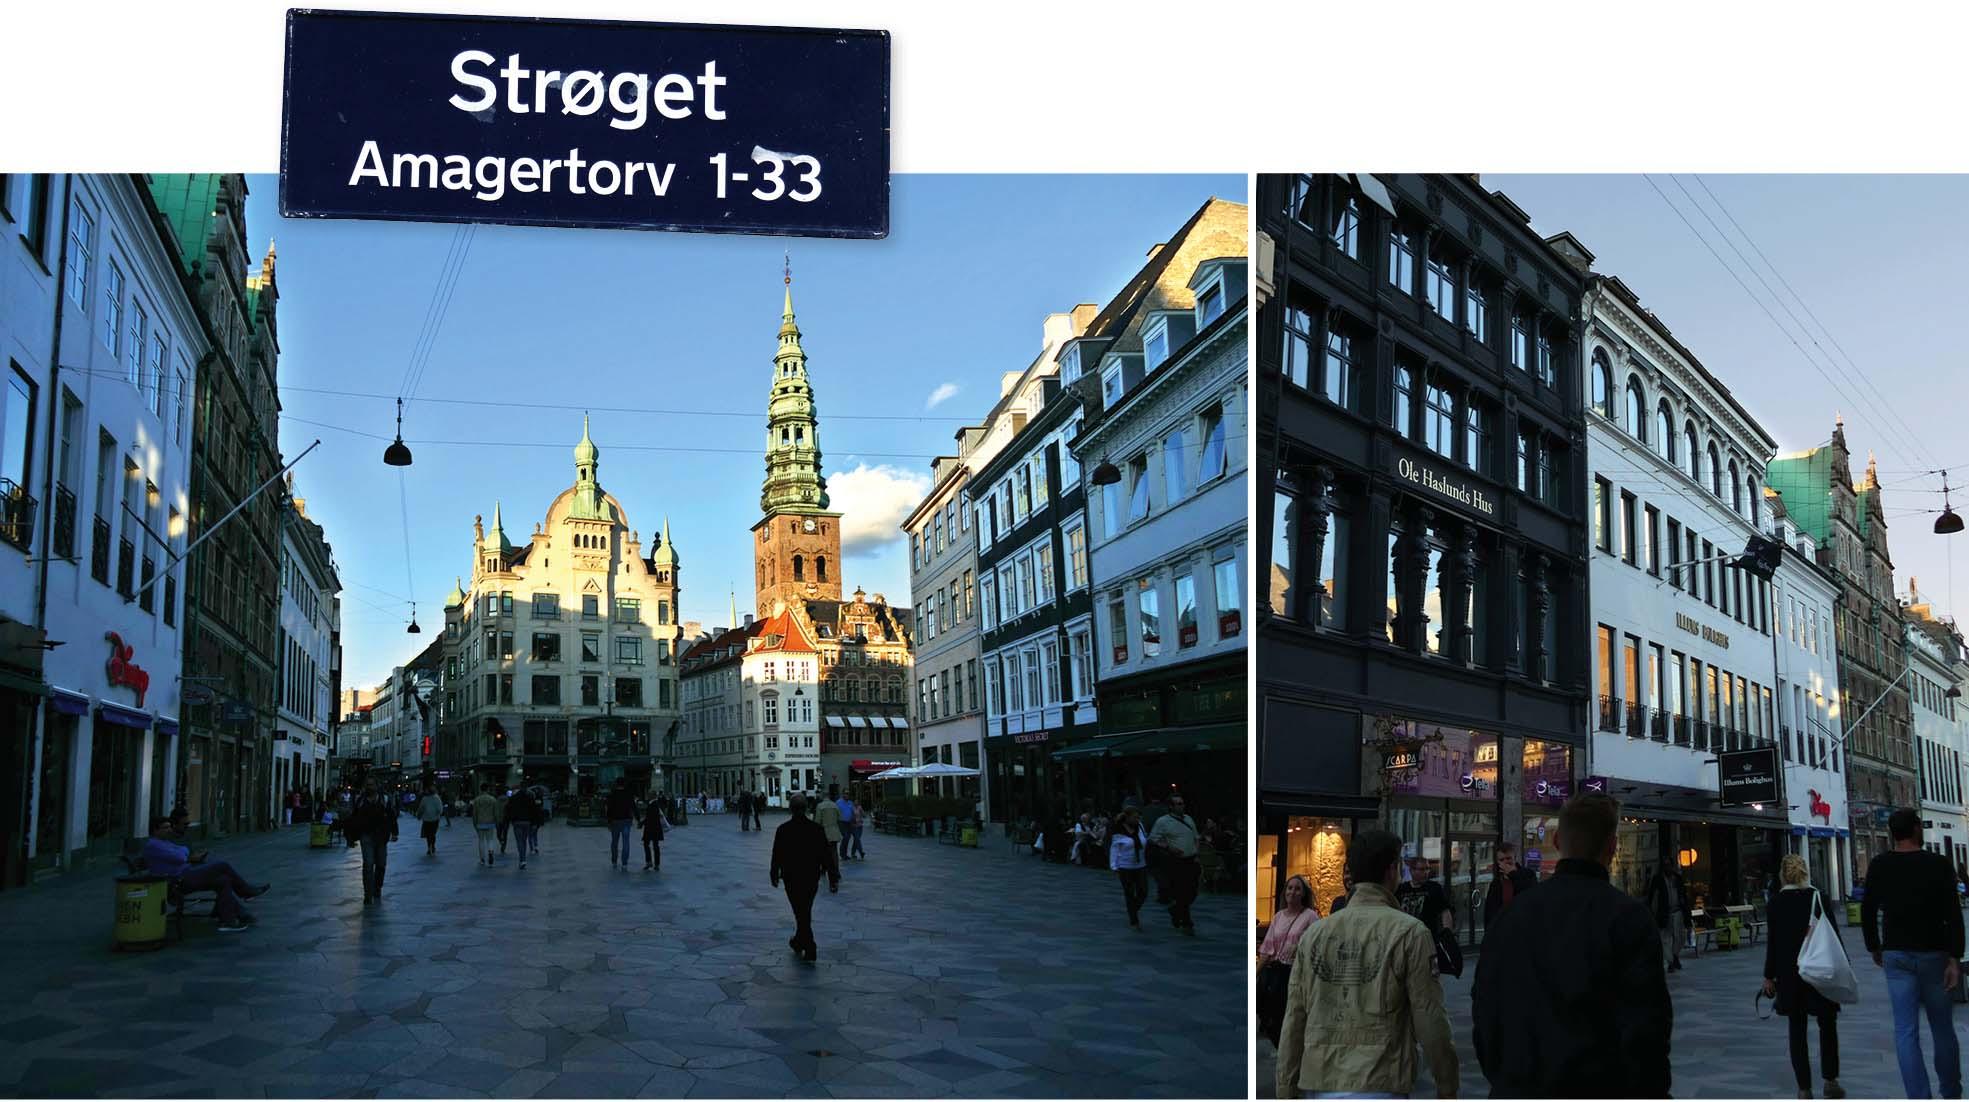 copenhague, danemark, Denmark, voyage, europe, strøget, rue, ville, magasins, shopping